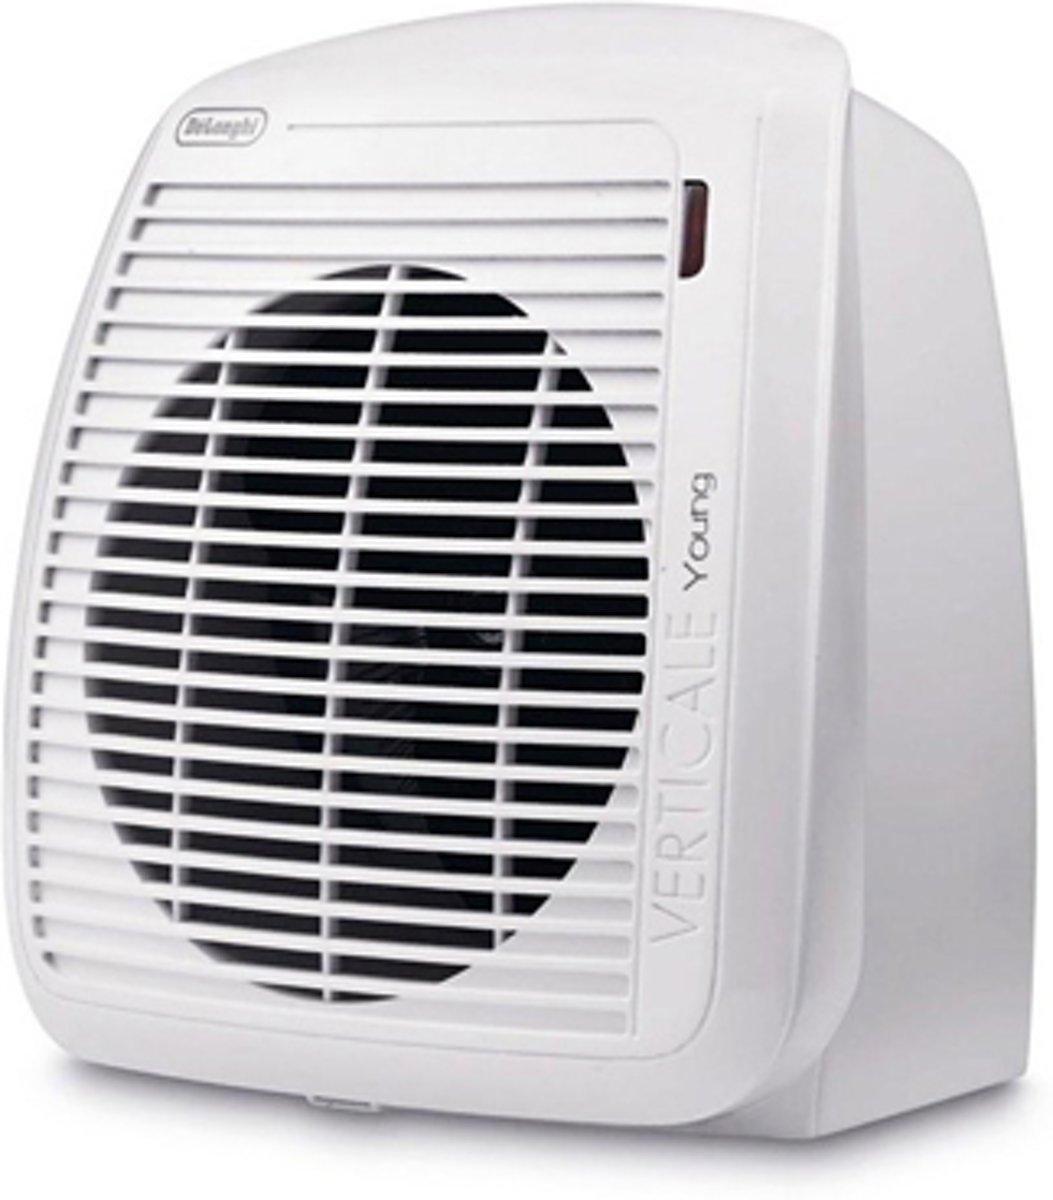 DeLonghi 0114.711000 Verwarming 65 m?